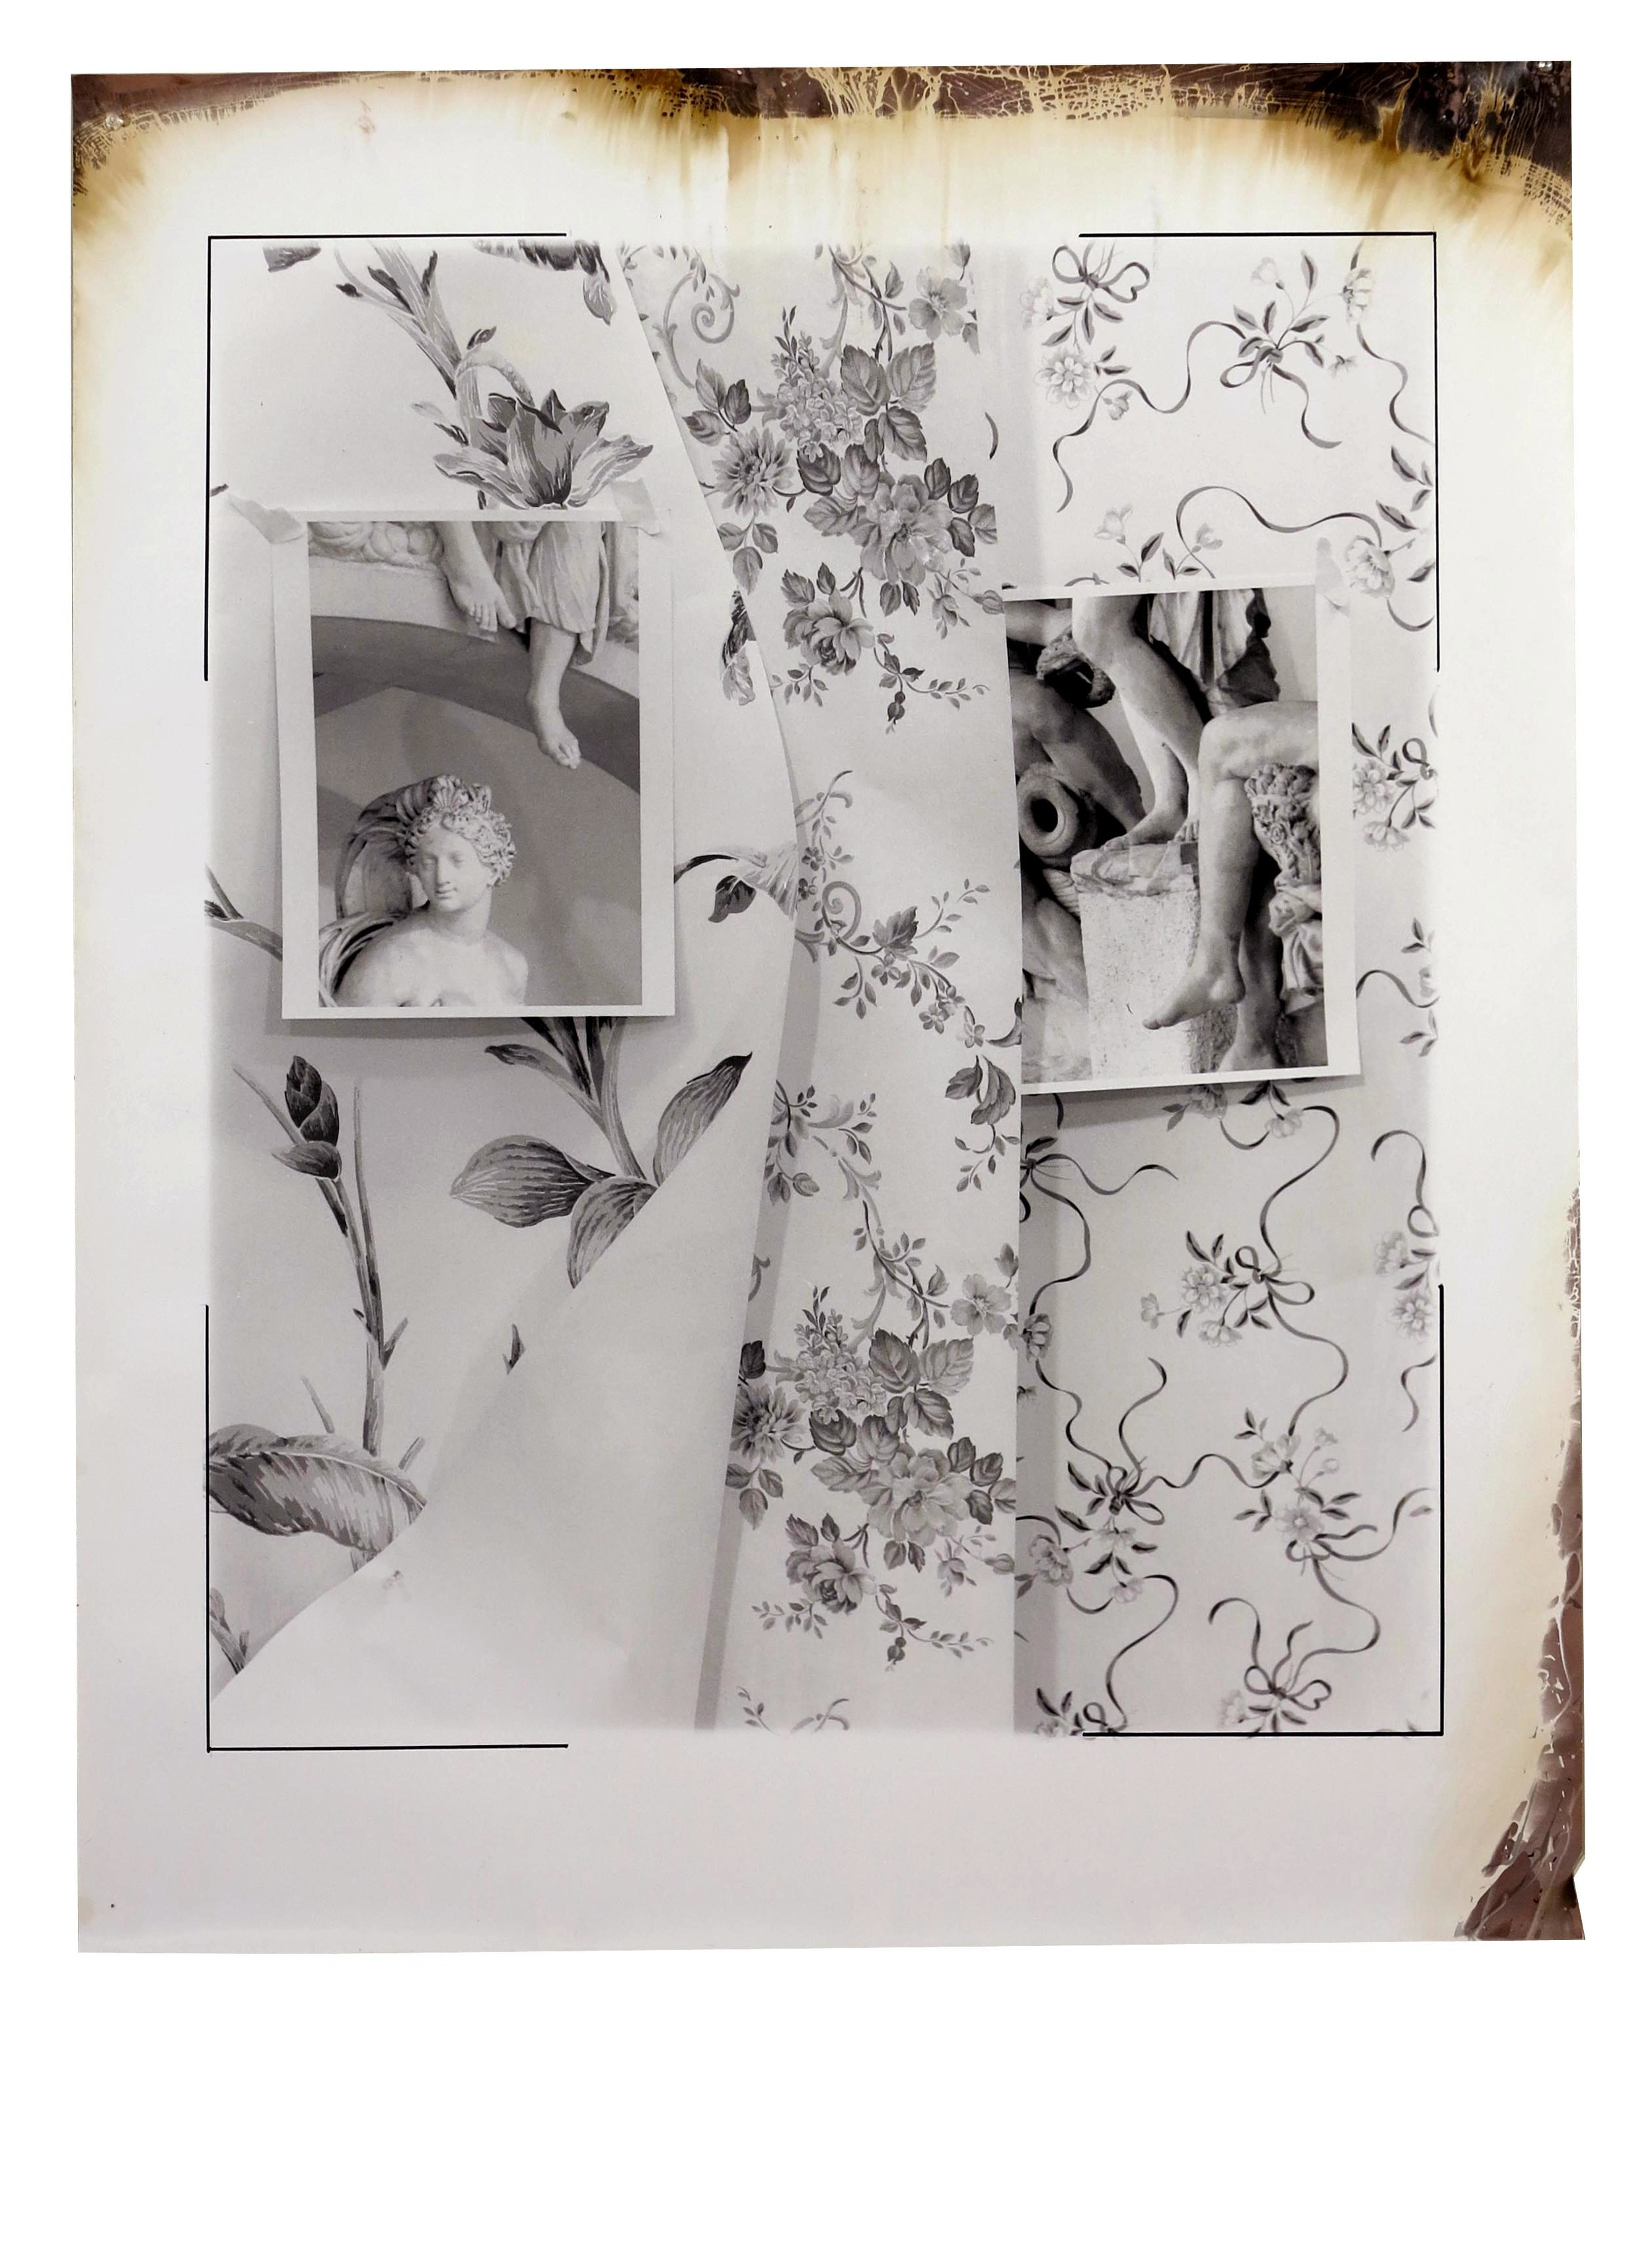 Ammannati Sculpture and Wallpaper I  2014  gelatin silver print  41.5 x 33 inches